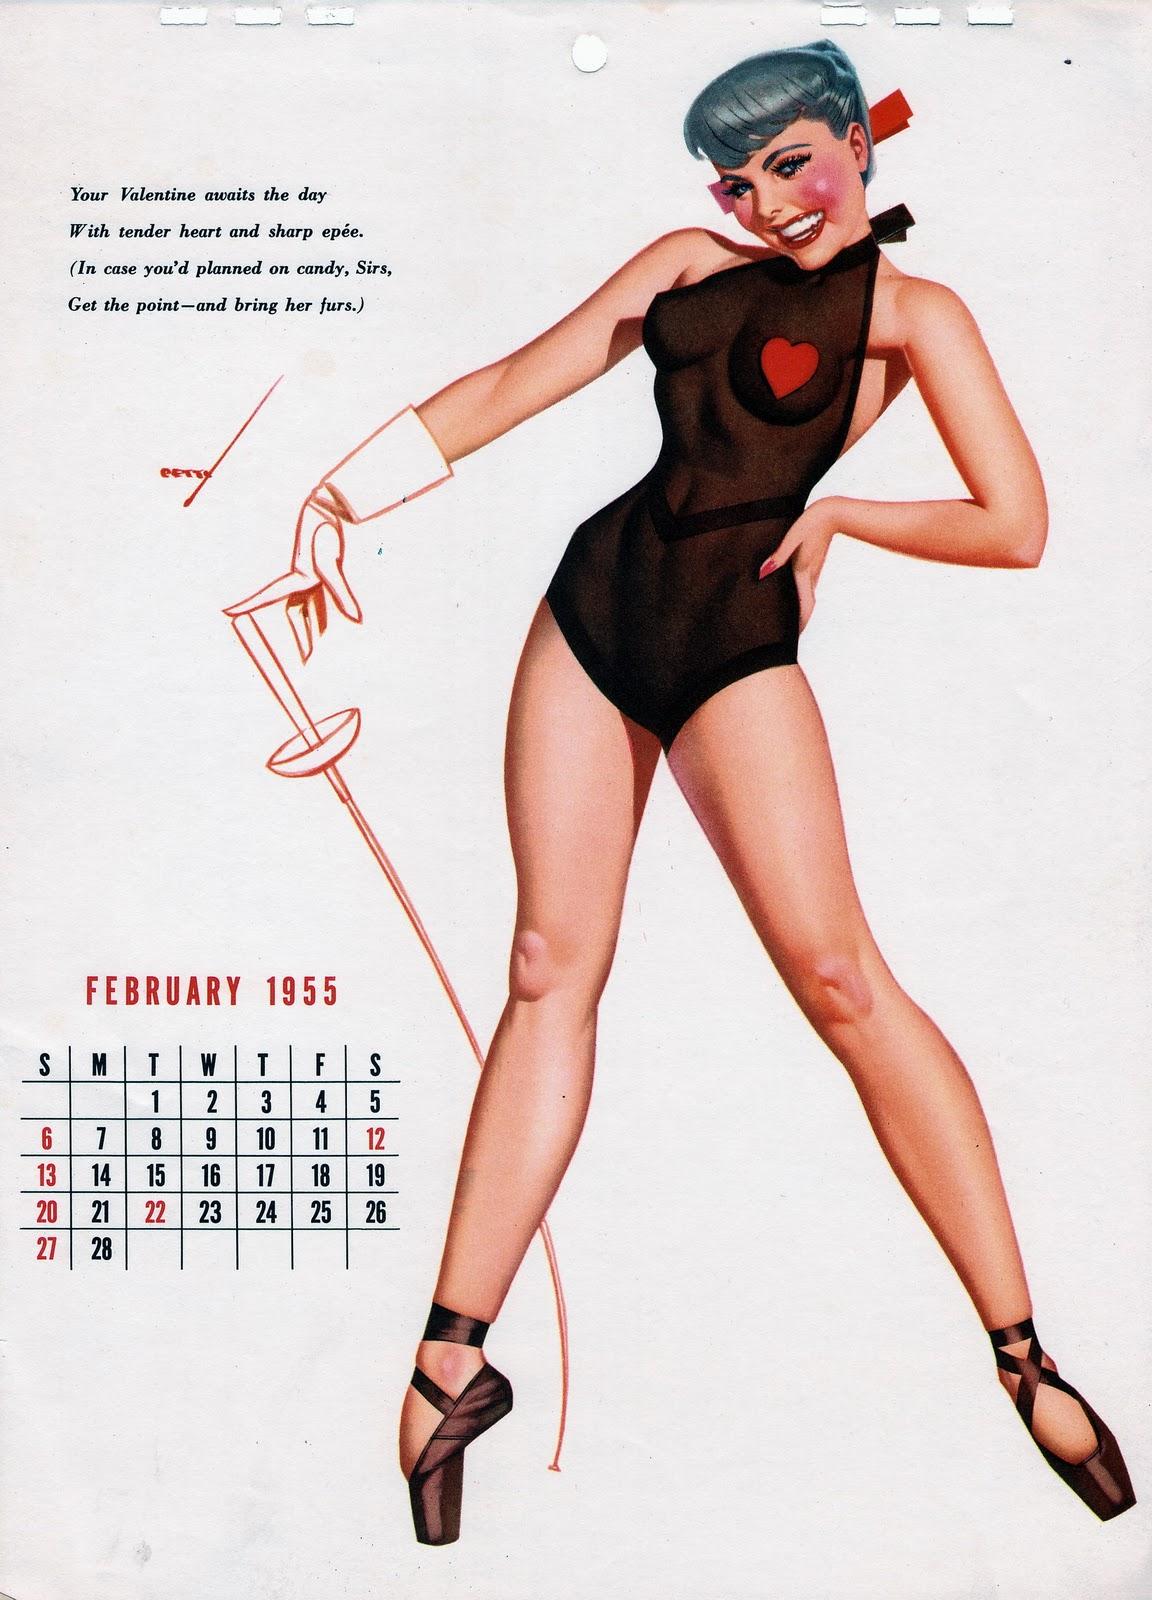 Pin Up Girl Art Vintage Wallpaper I M Not Old I M Vintage 1955 February Calendar Pin Up